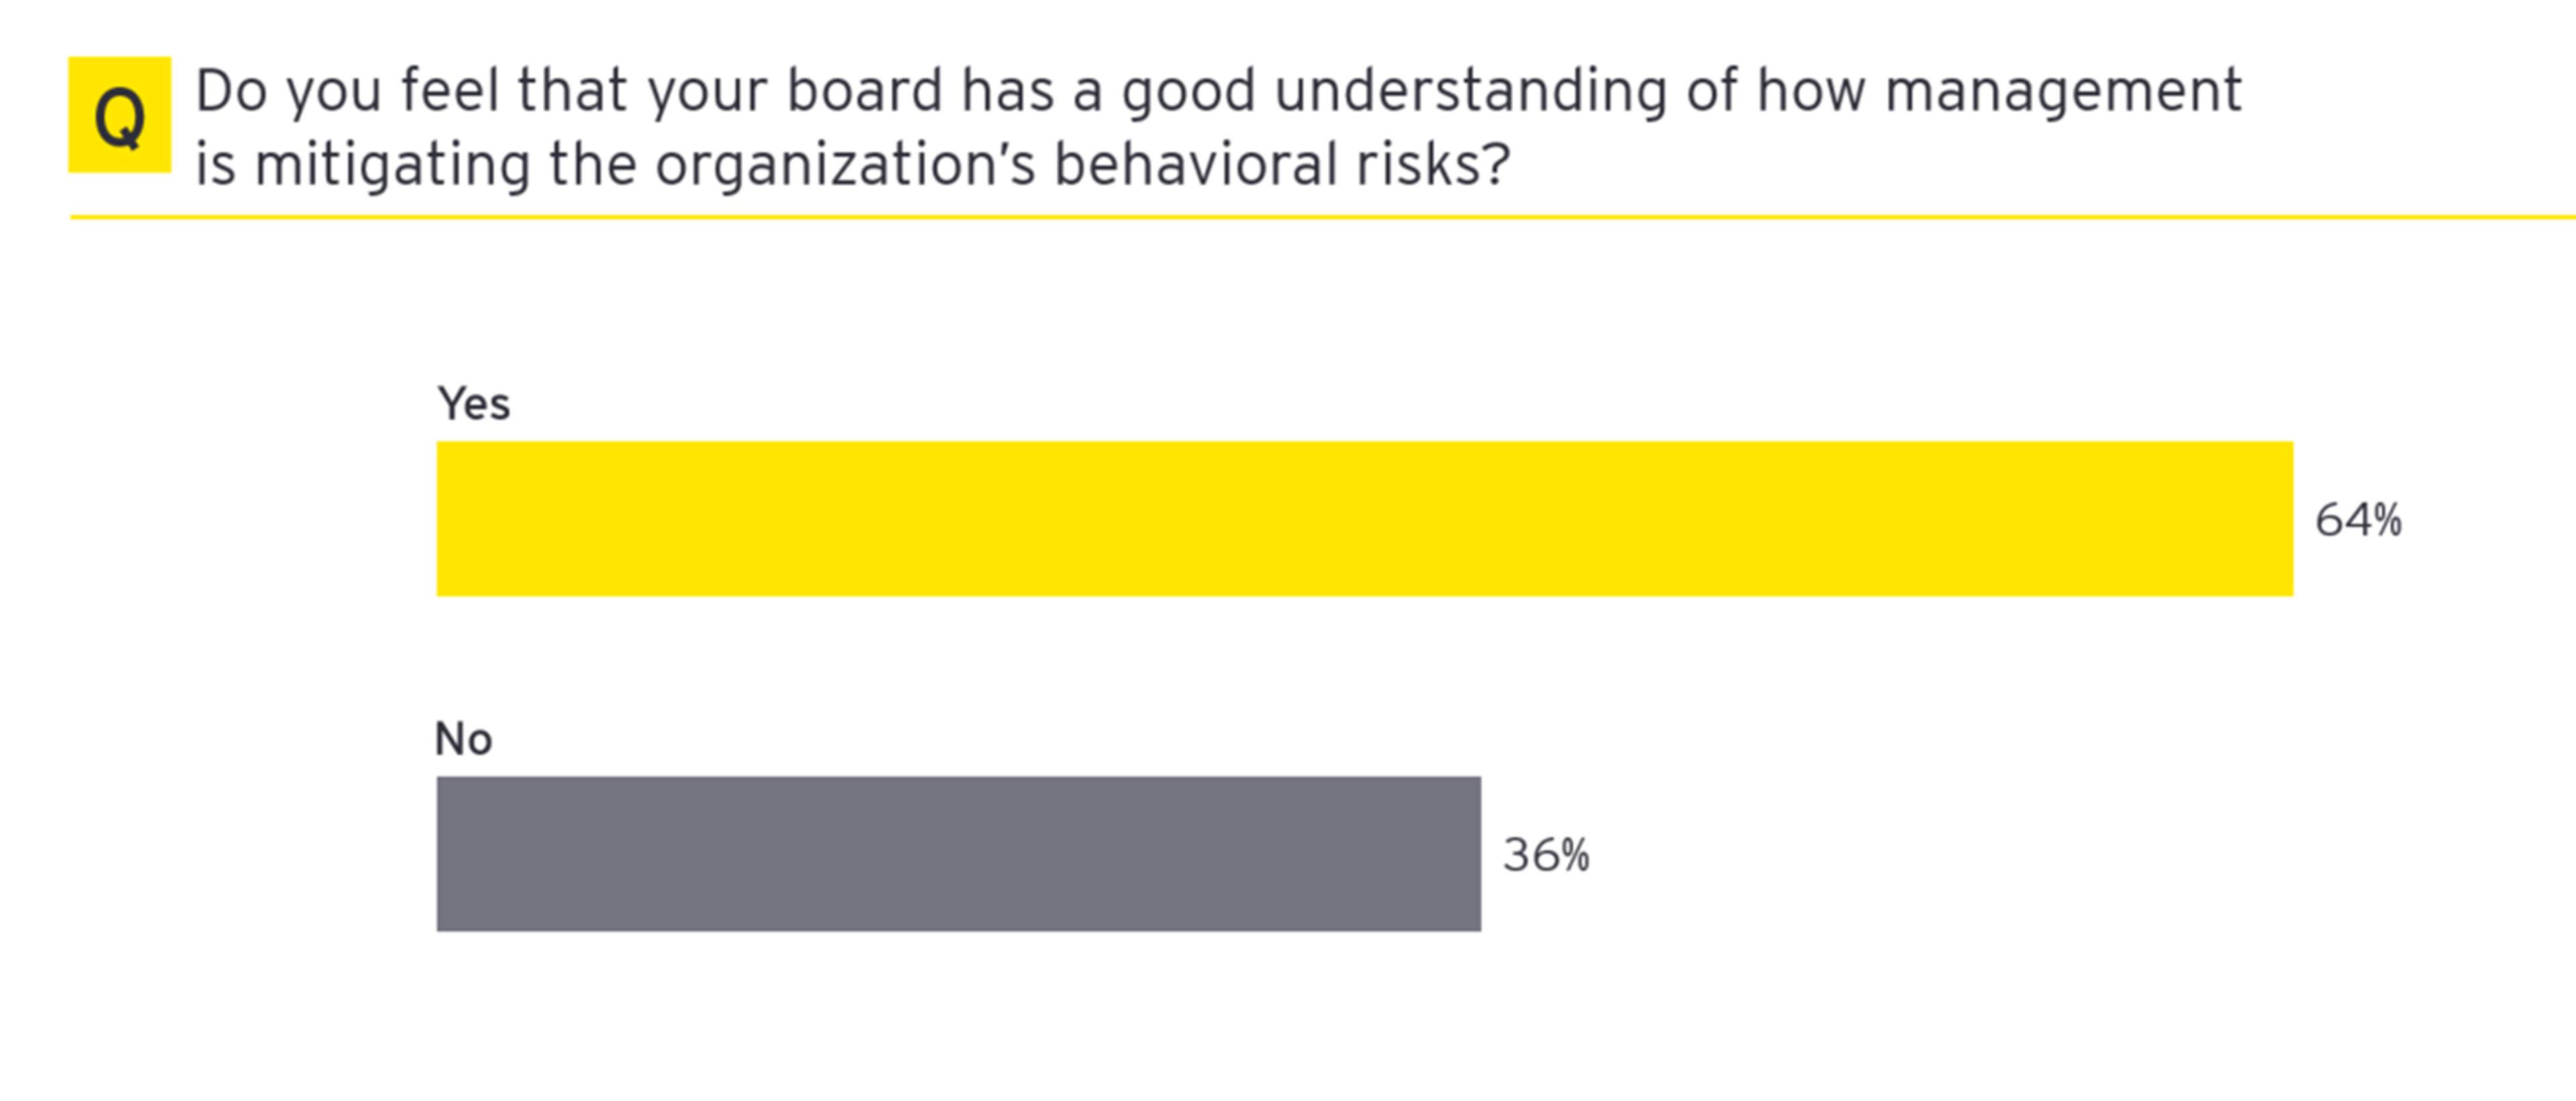 Mitigating the orgainizations behavioral risks